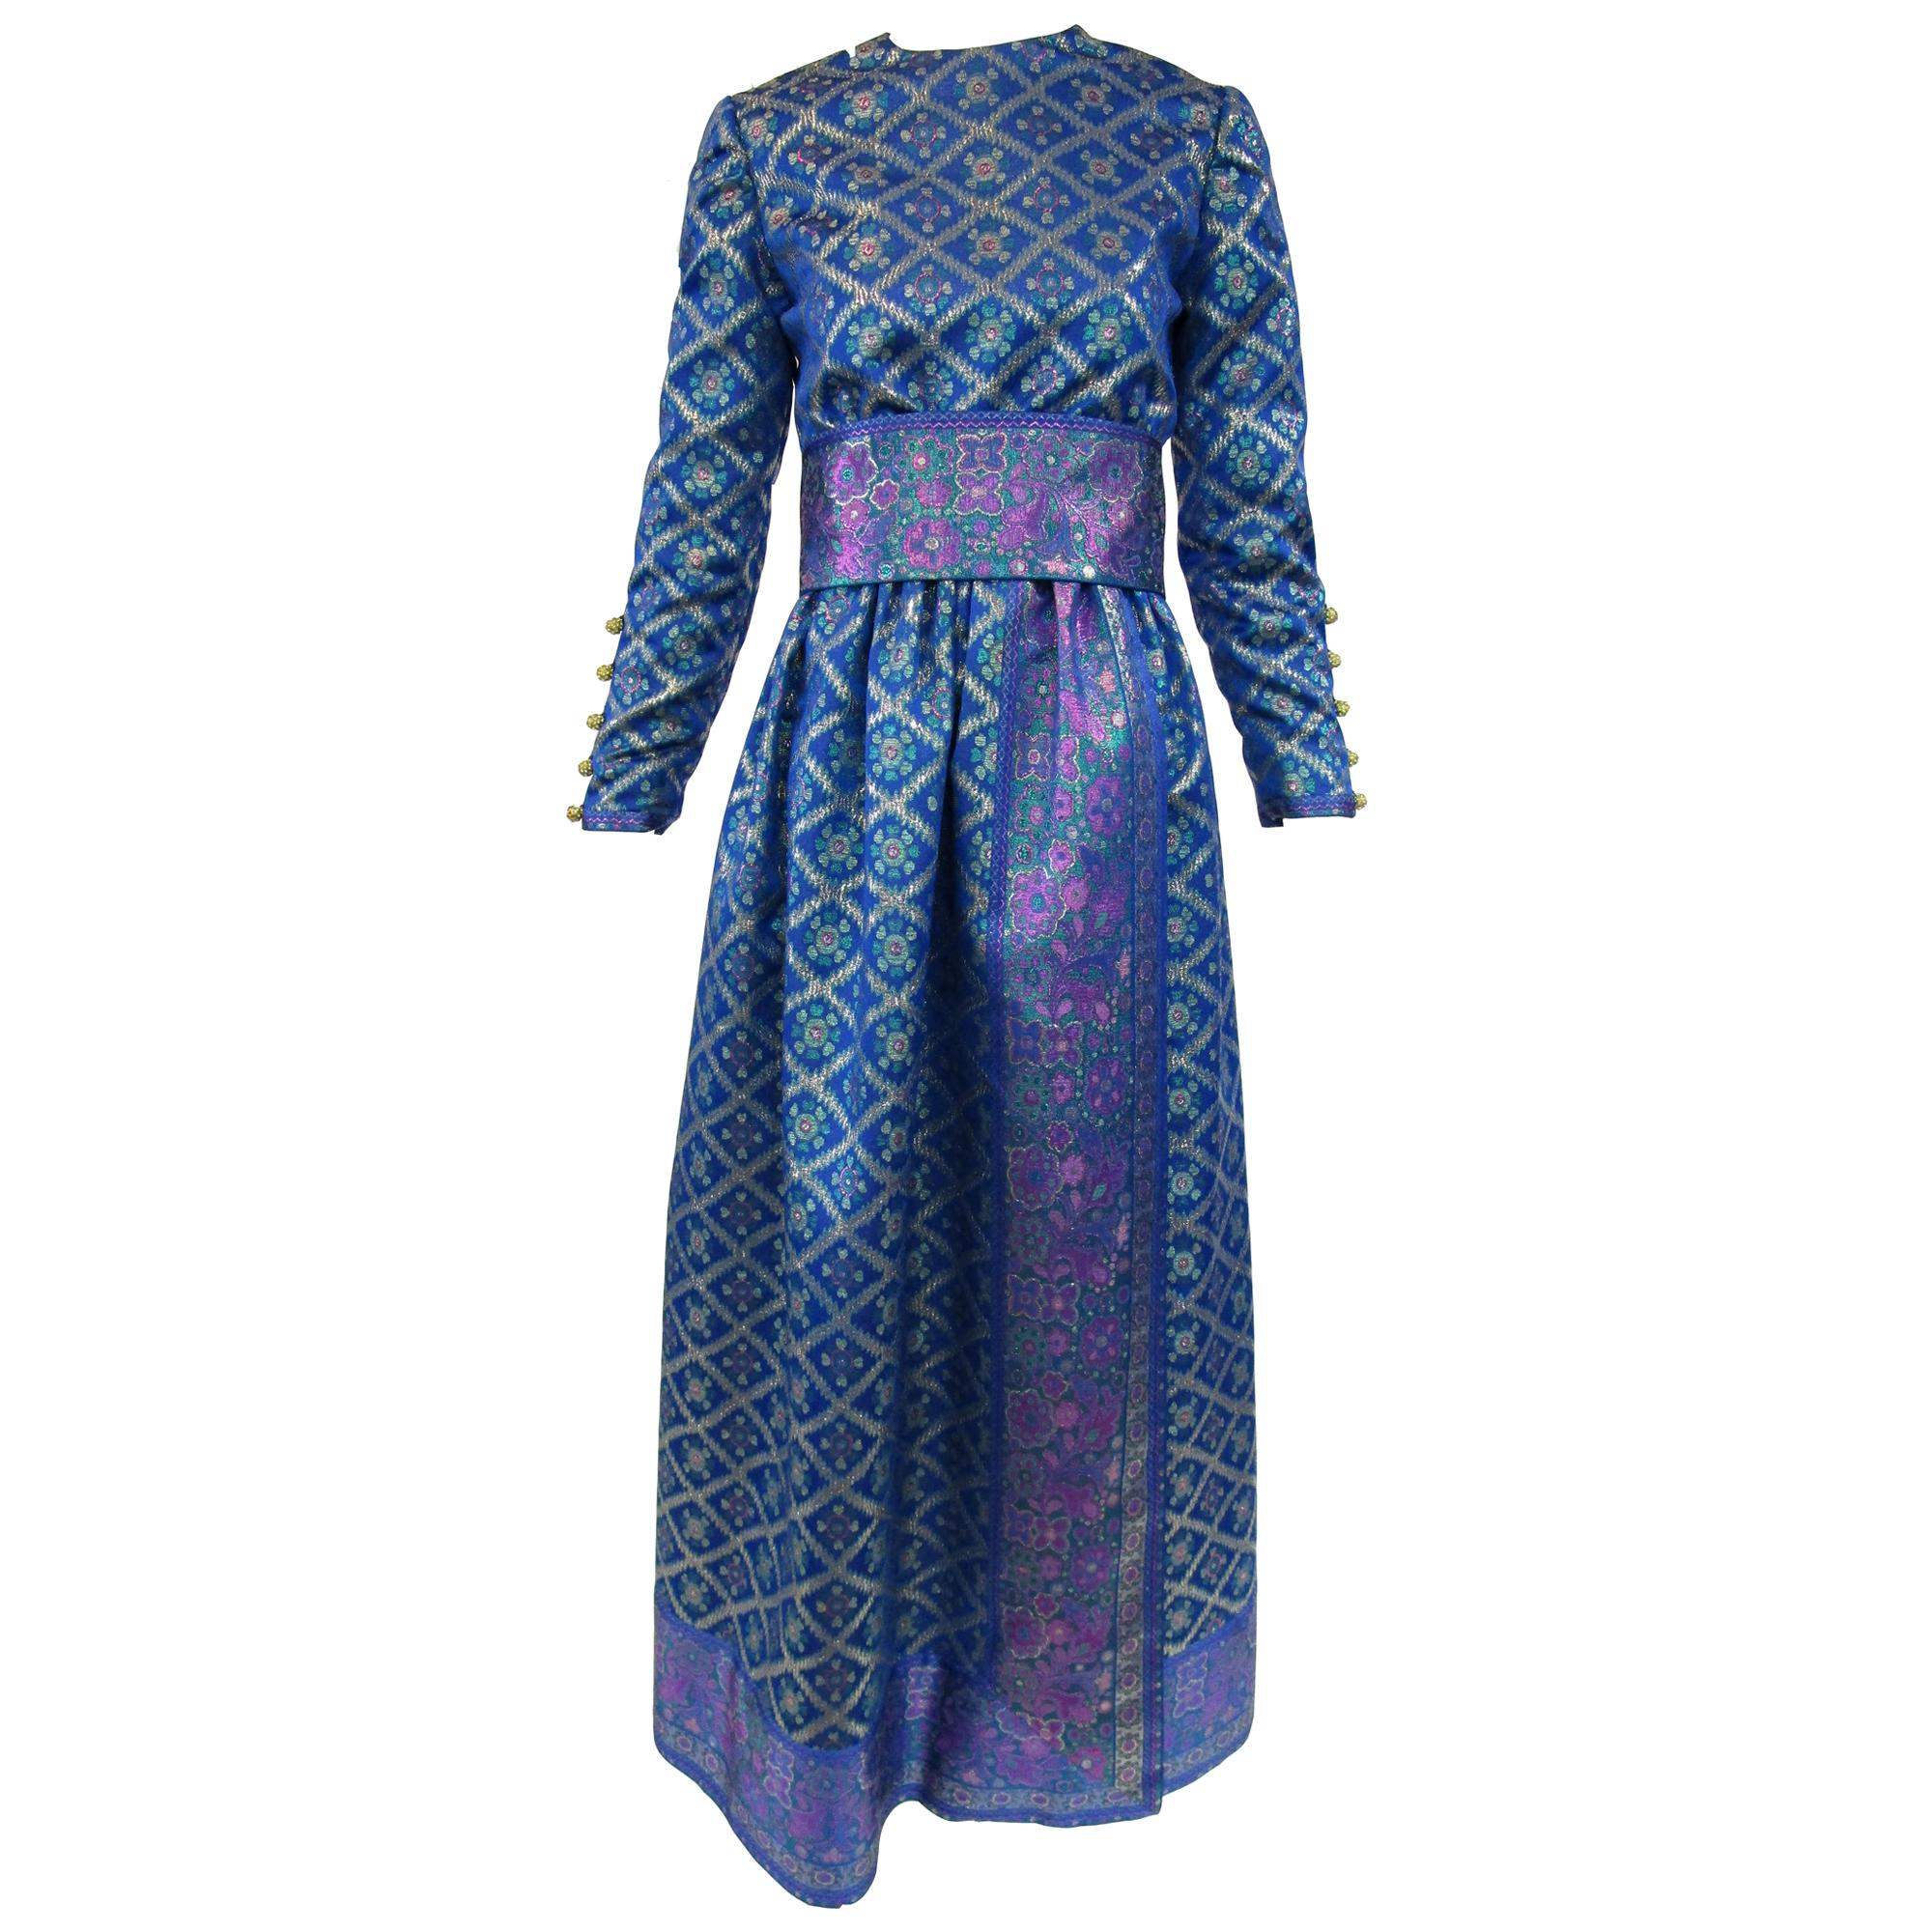 1960s Oscar de la Renta Blue Metallic Floral Brocade Evening Dress